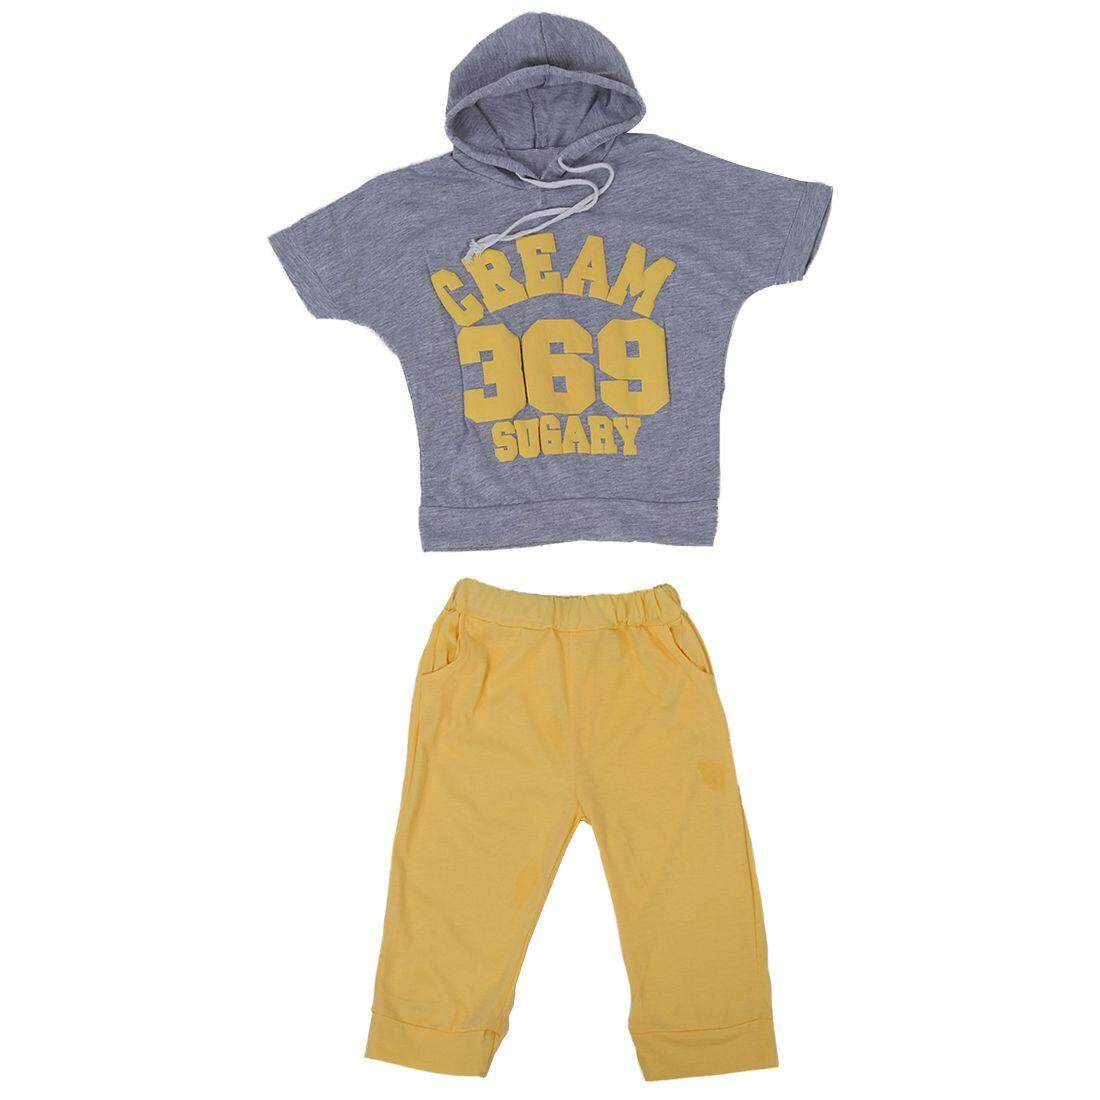 Baby Girls Boy Short Sleeve Sportswear Suit Hoodie T-shirt Tops Short Pants Yellow 2-3 Years - intl